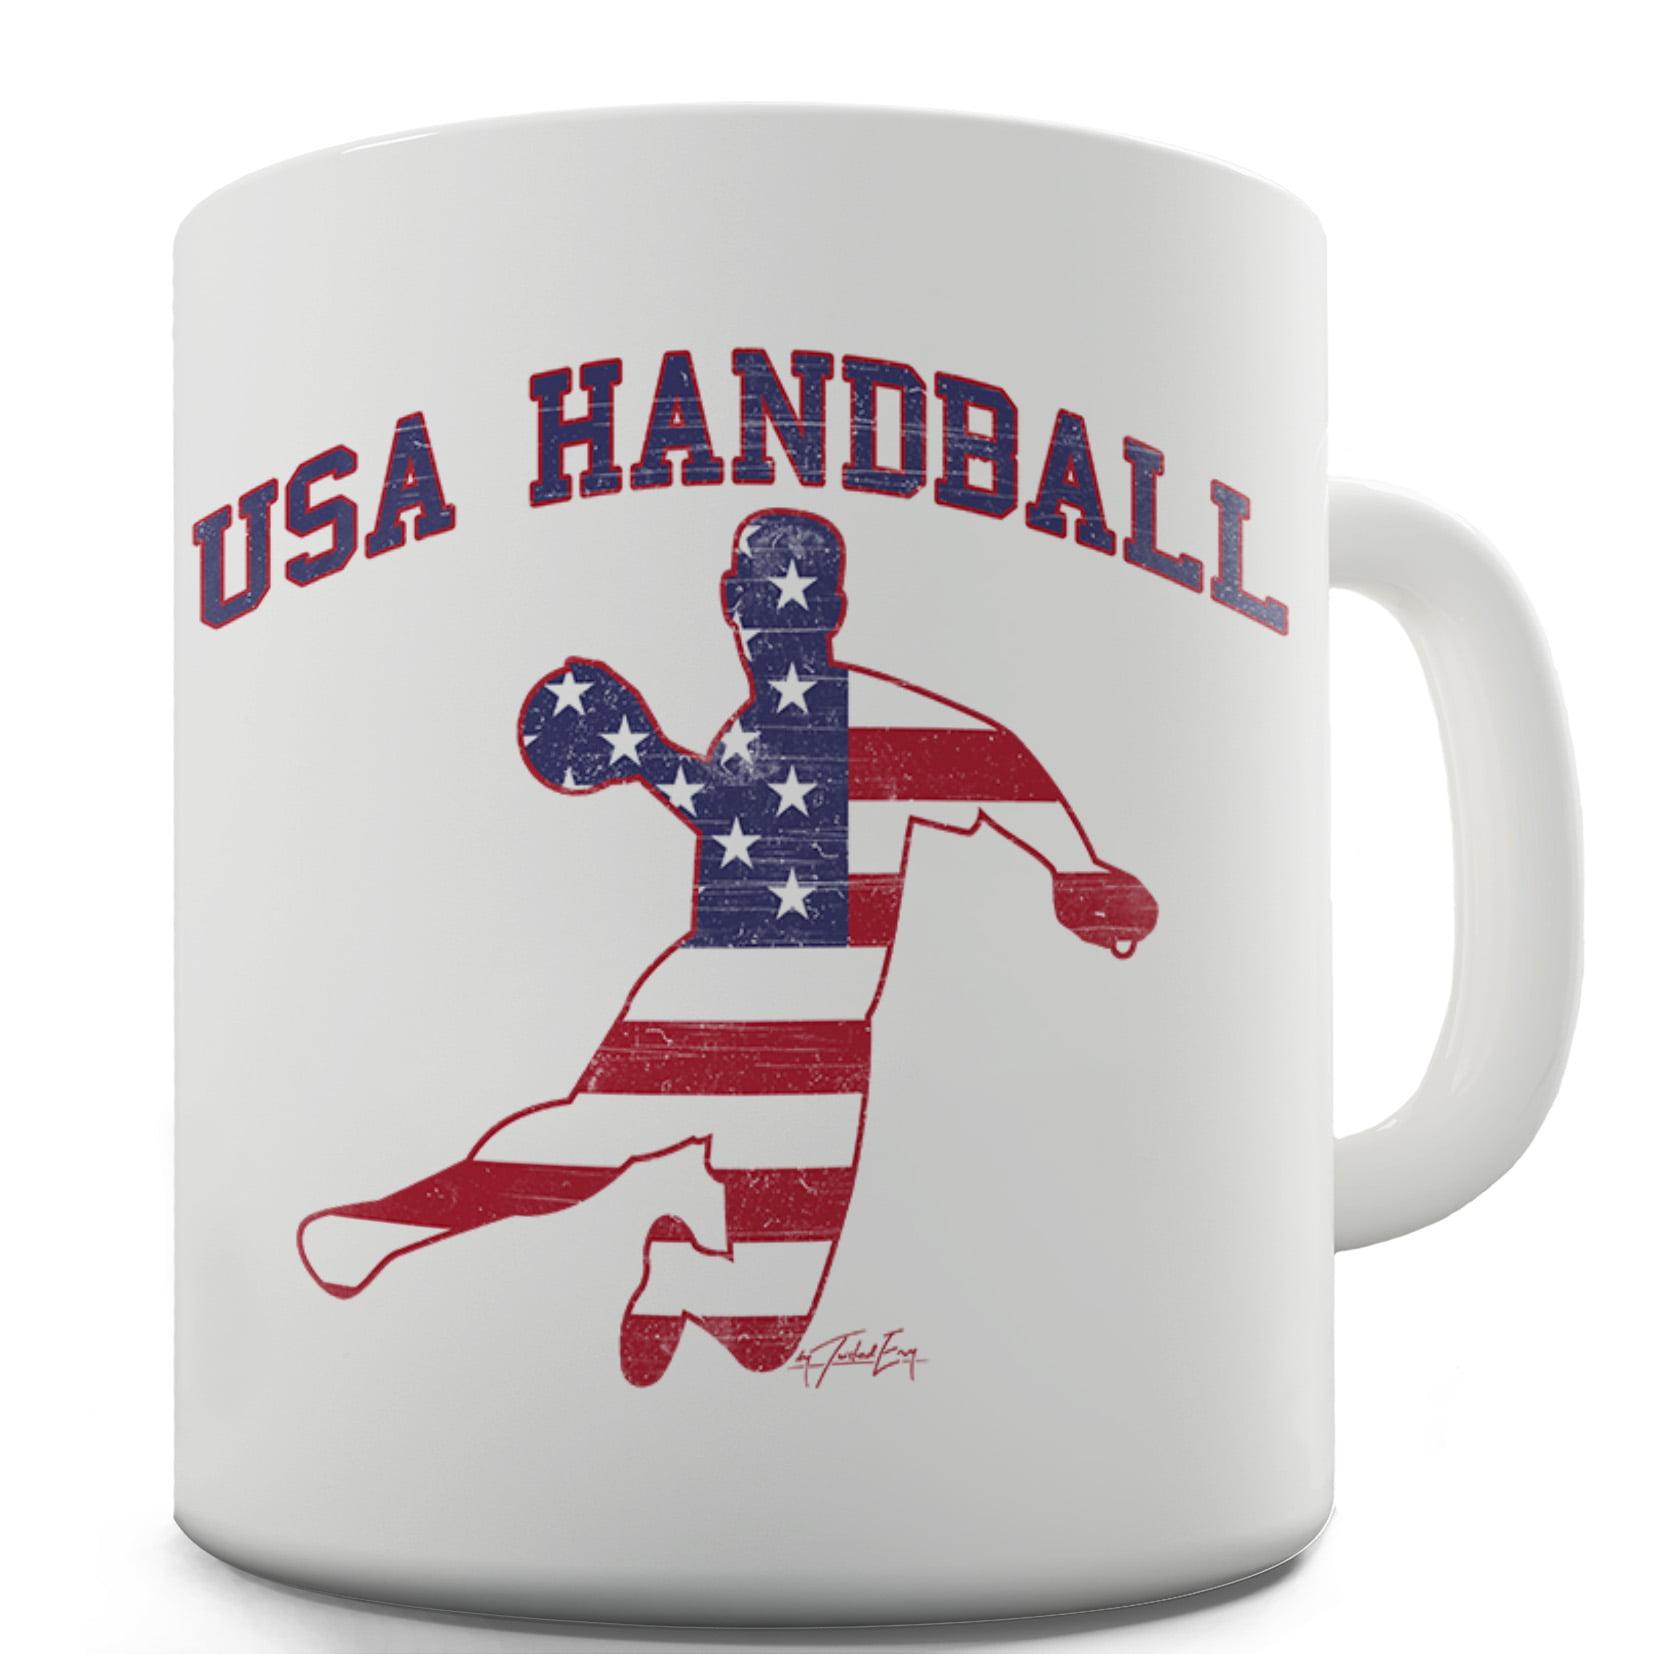 USA Handball Ceramic Novelty Gift Mug by Ink Rocks